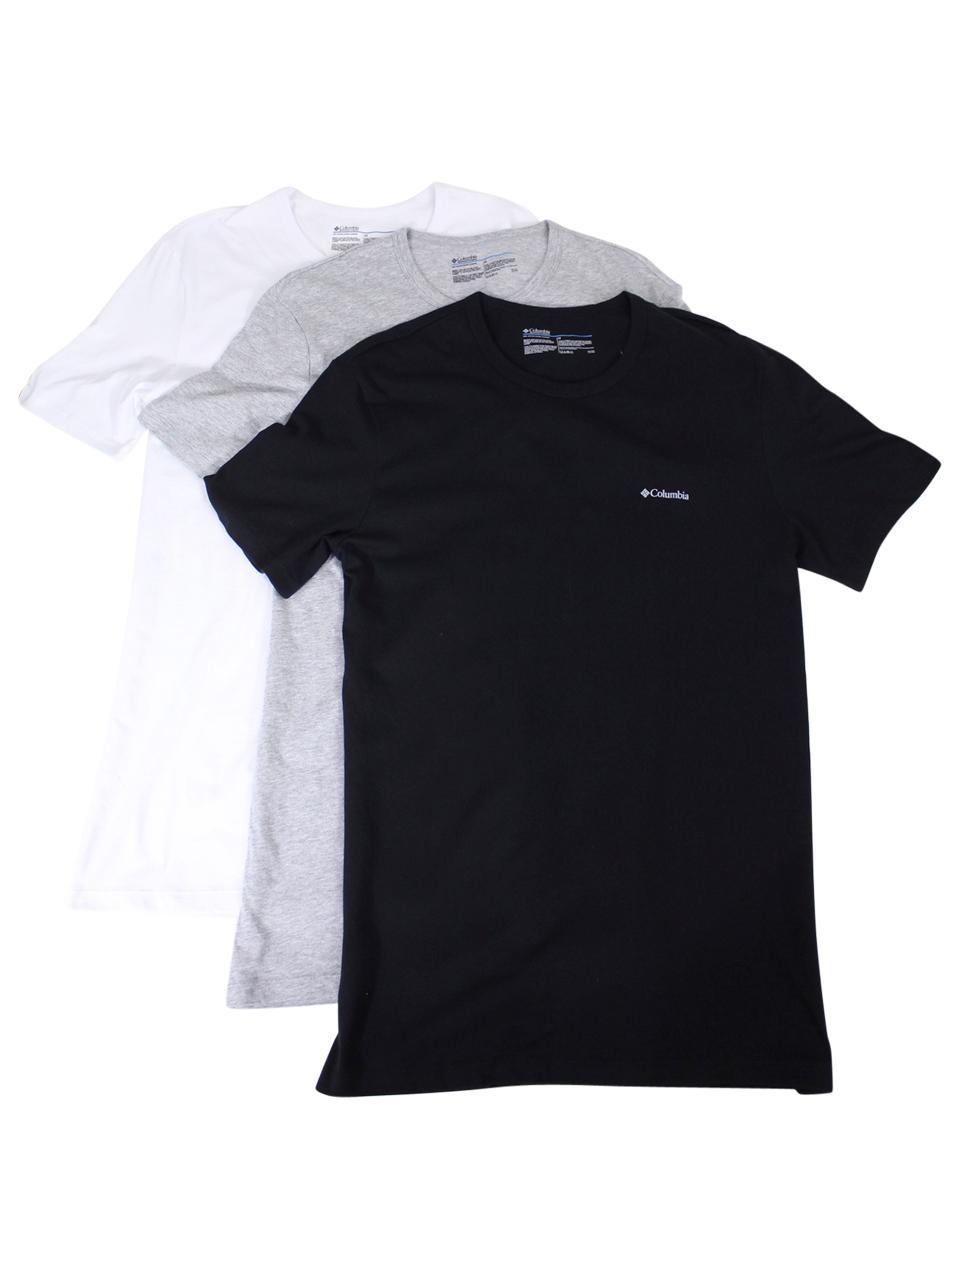 Image of Columbia Men's 3 Pc Short Sleeve Crew Neck Cotton T Shirt - White/Grey/Black - Small